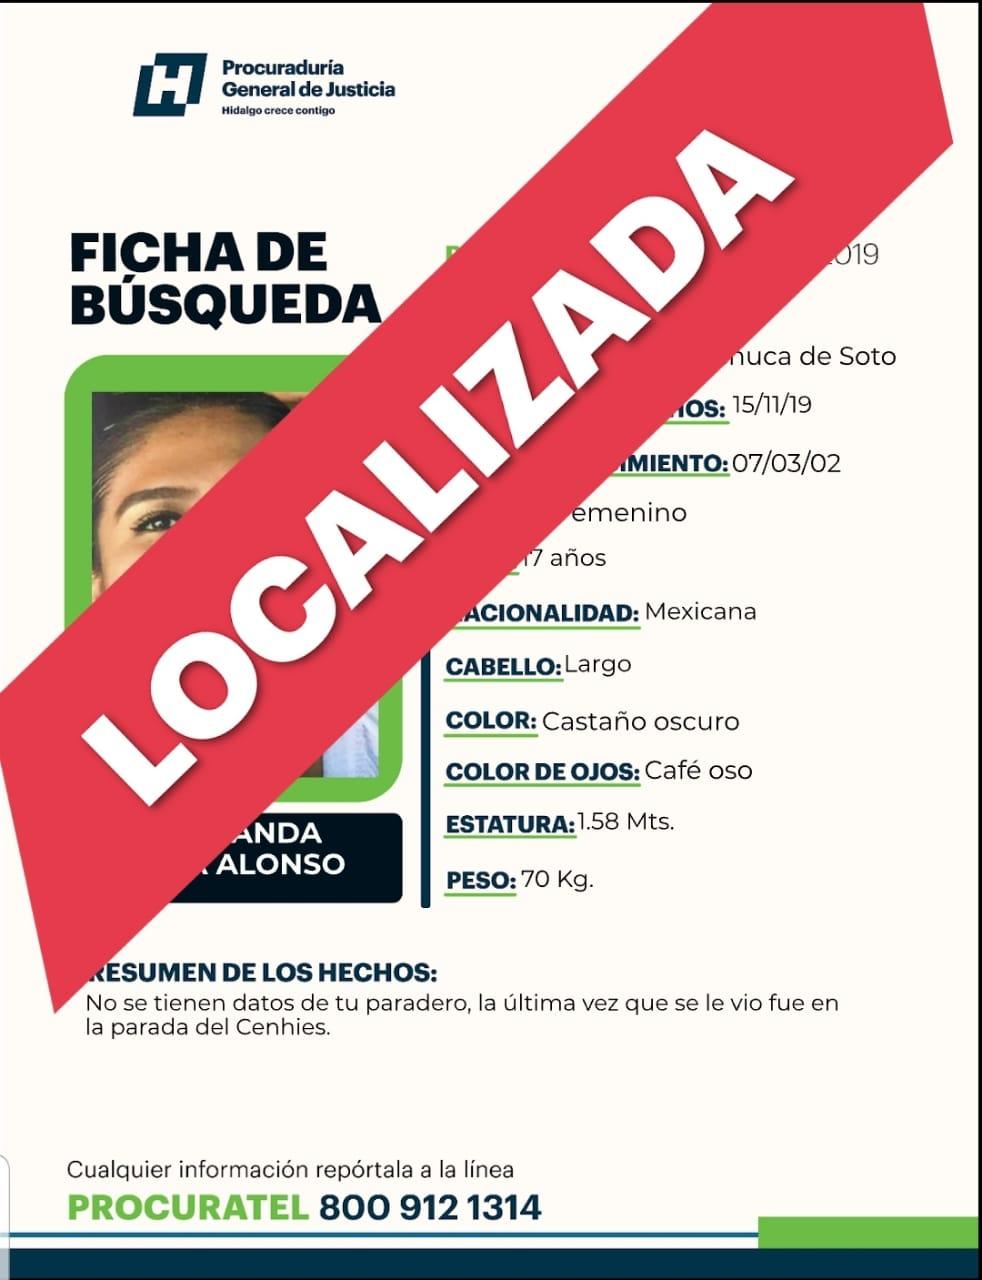 LOCALIZADA Se busca a Fernanda Lara Alonso, desapareció en Pachuca - Criterio Hidalgo